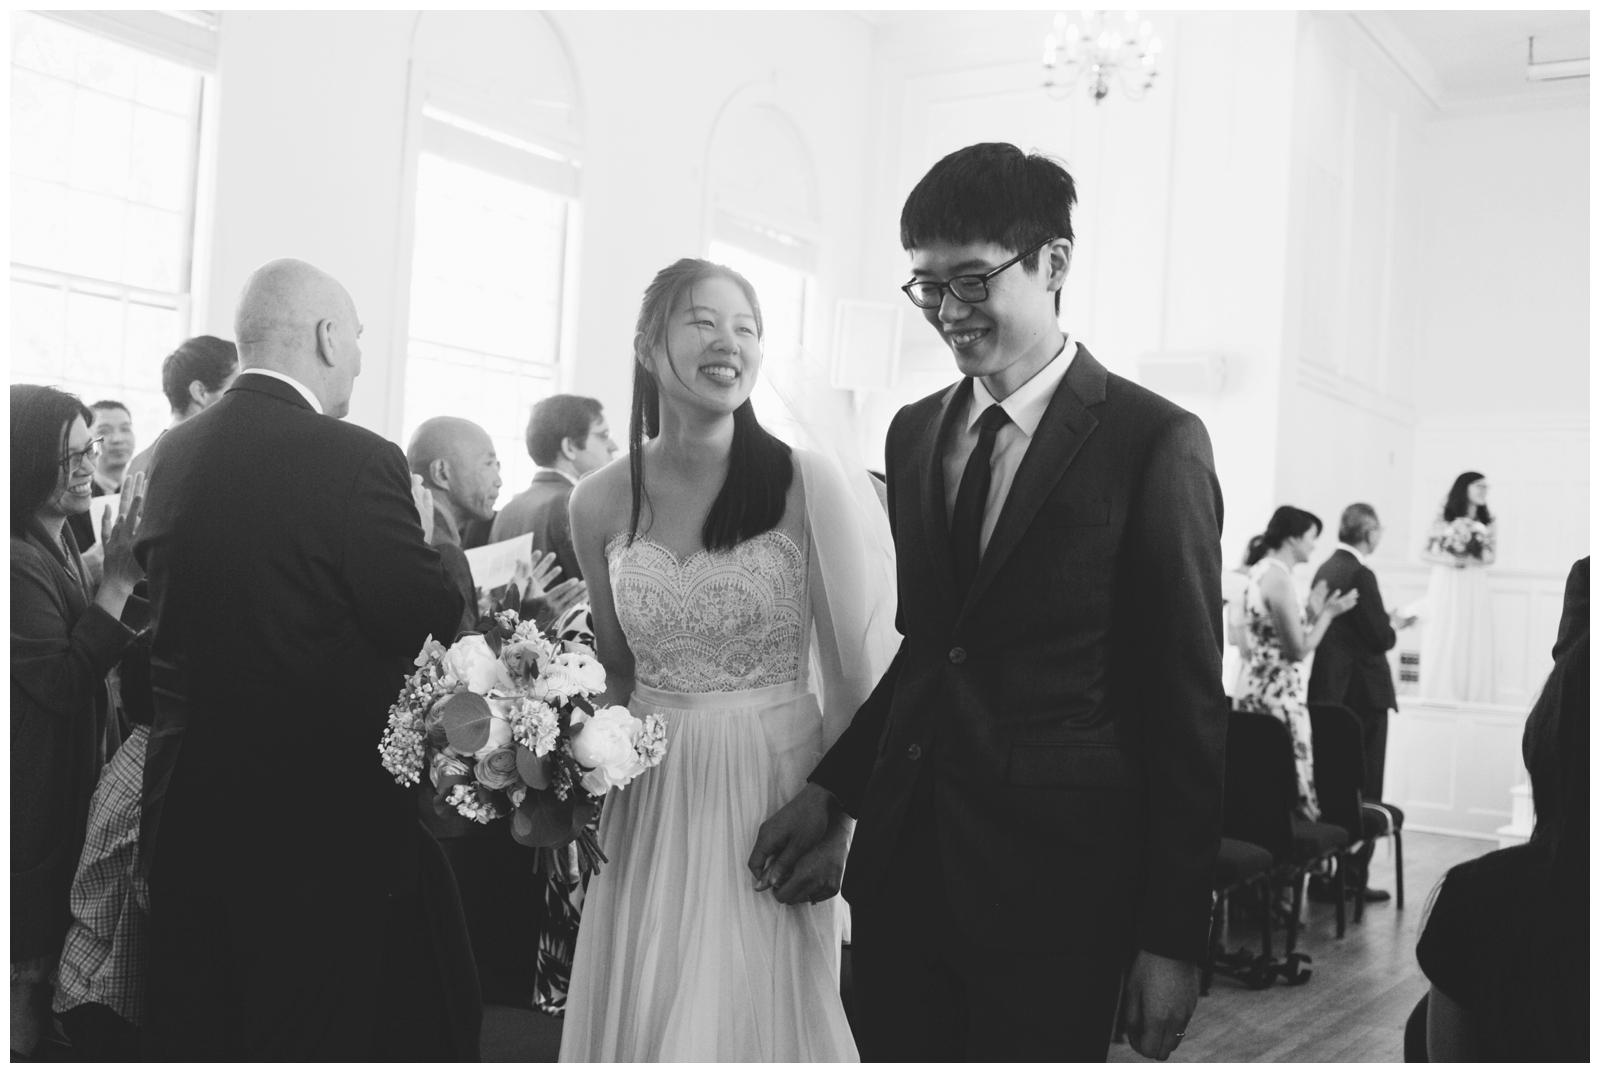 Samberg-Conference-Center-Boston-Wedding-Photographer-Bailey-Q-Photo-064.jpg